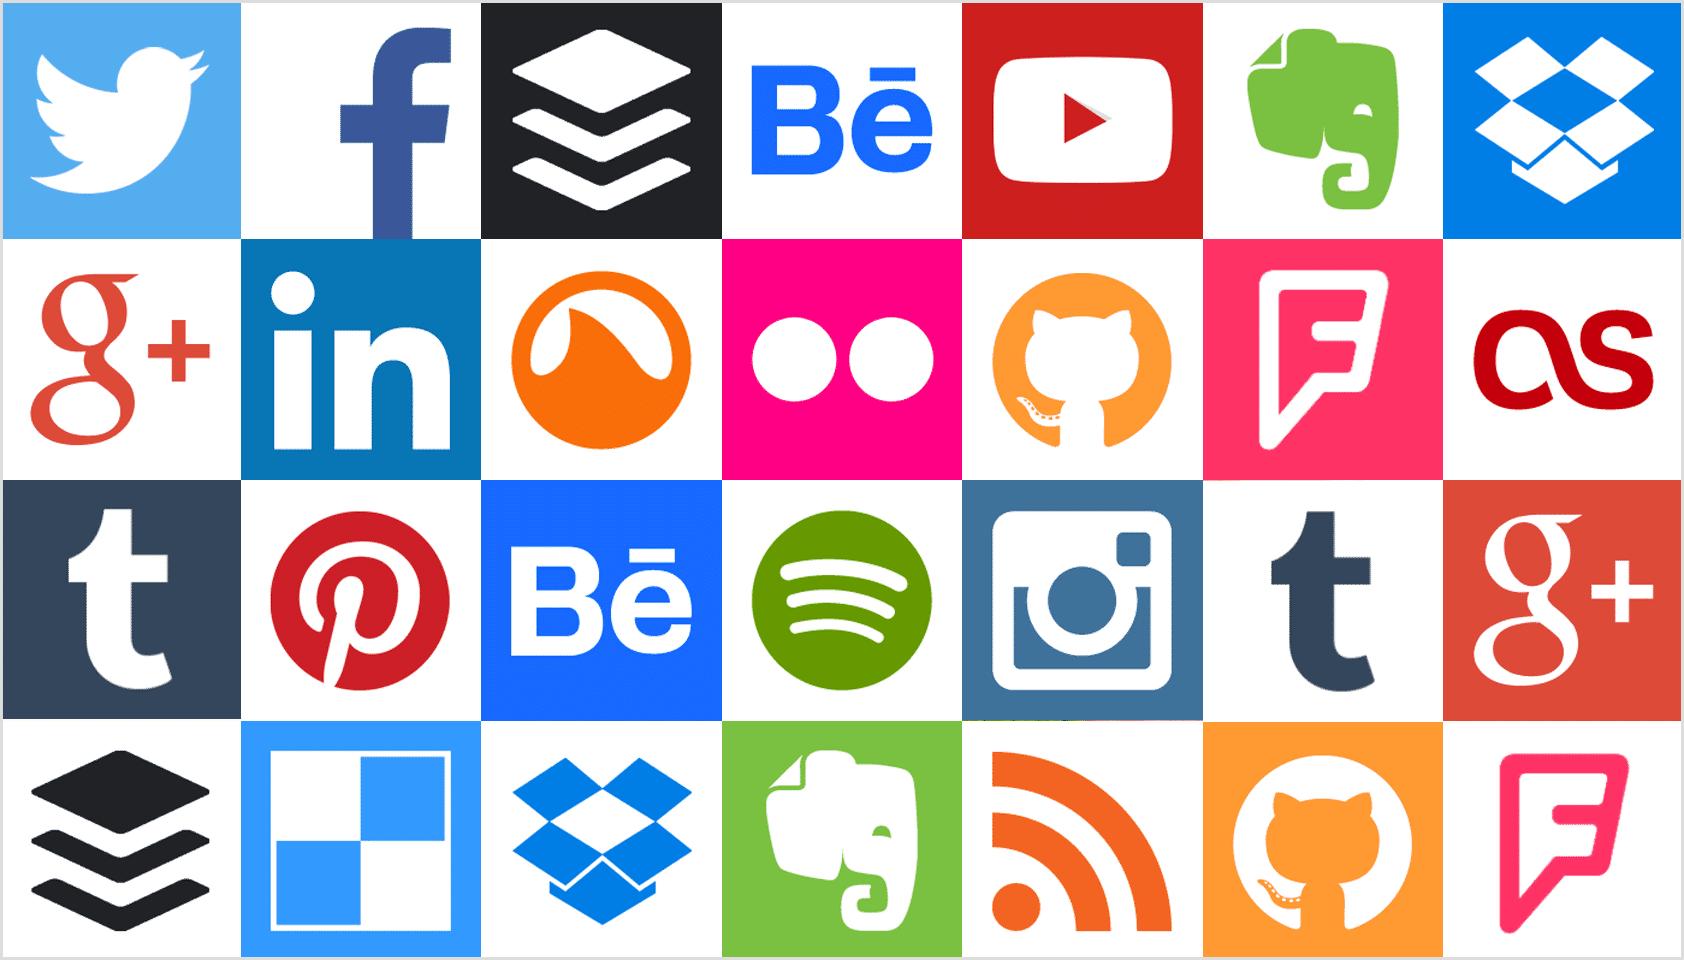 Social Standard Square icon sets